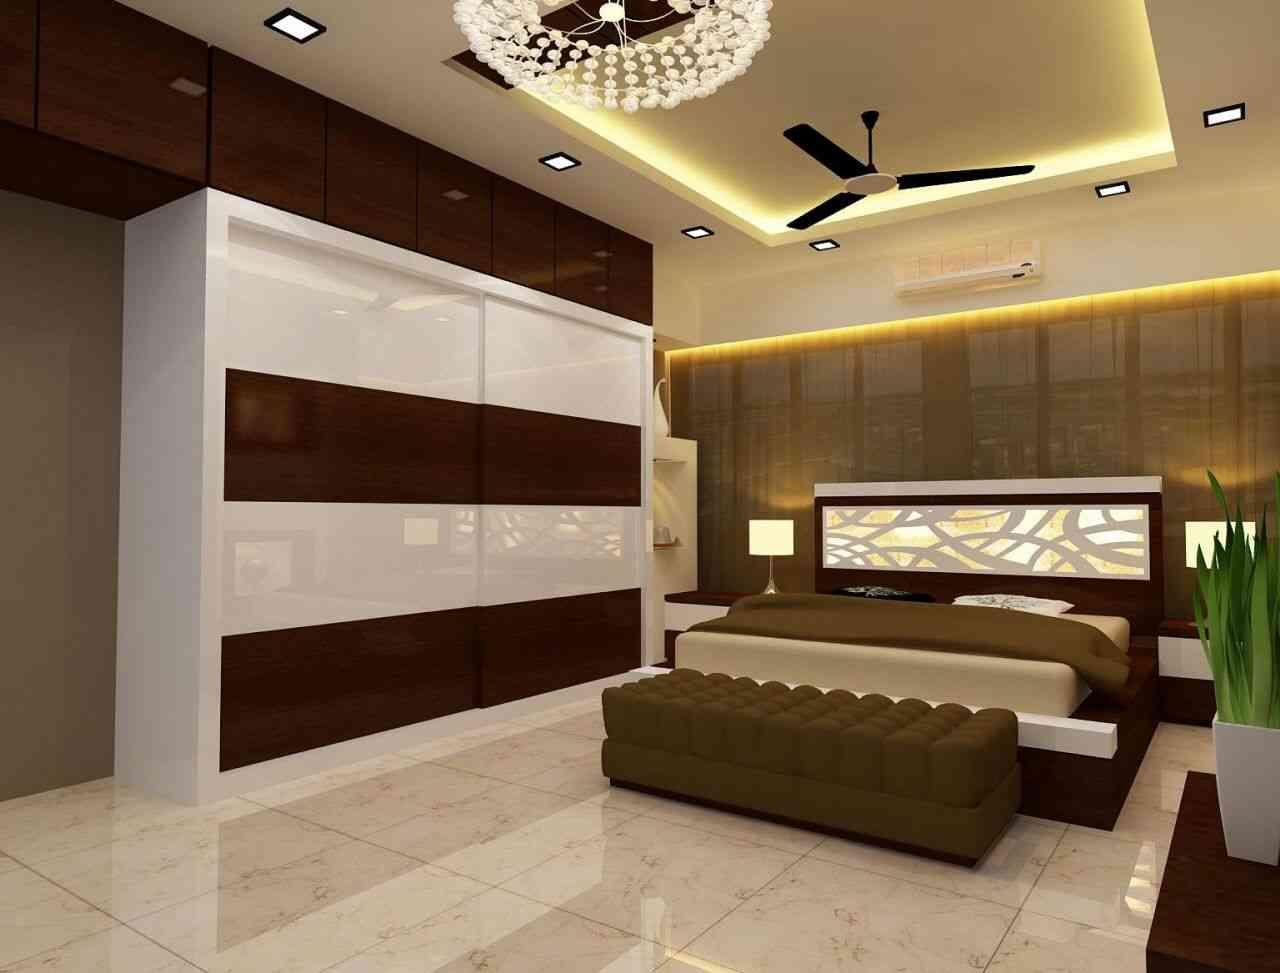 3BHK Villa interior Design